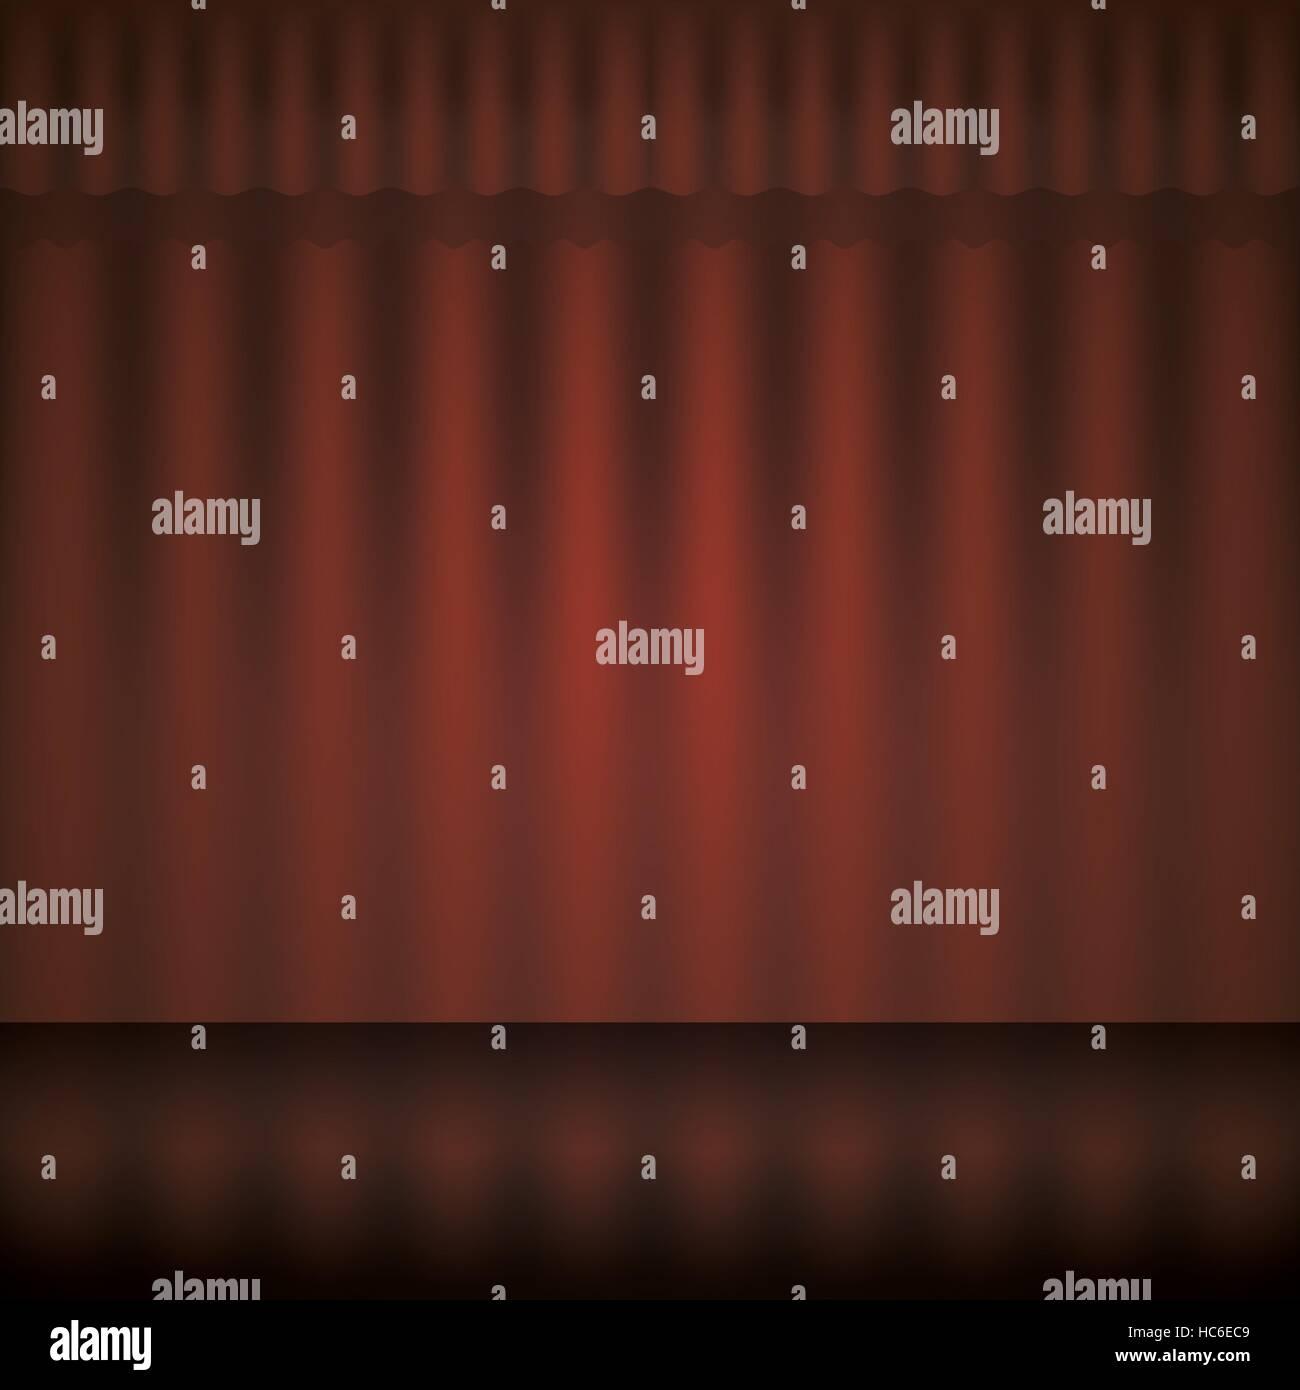 Blurred background design - Stock Image